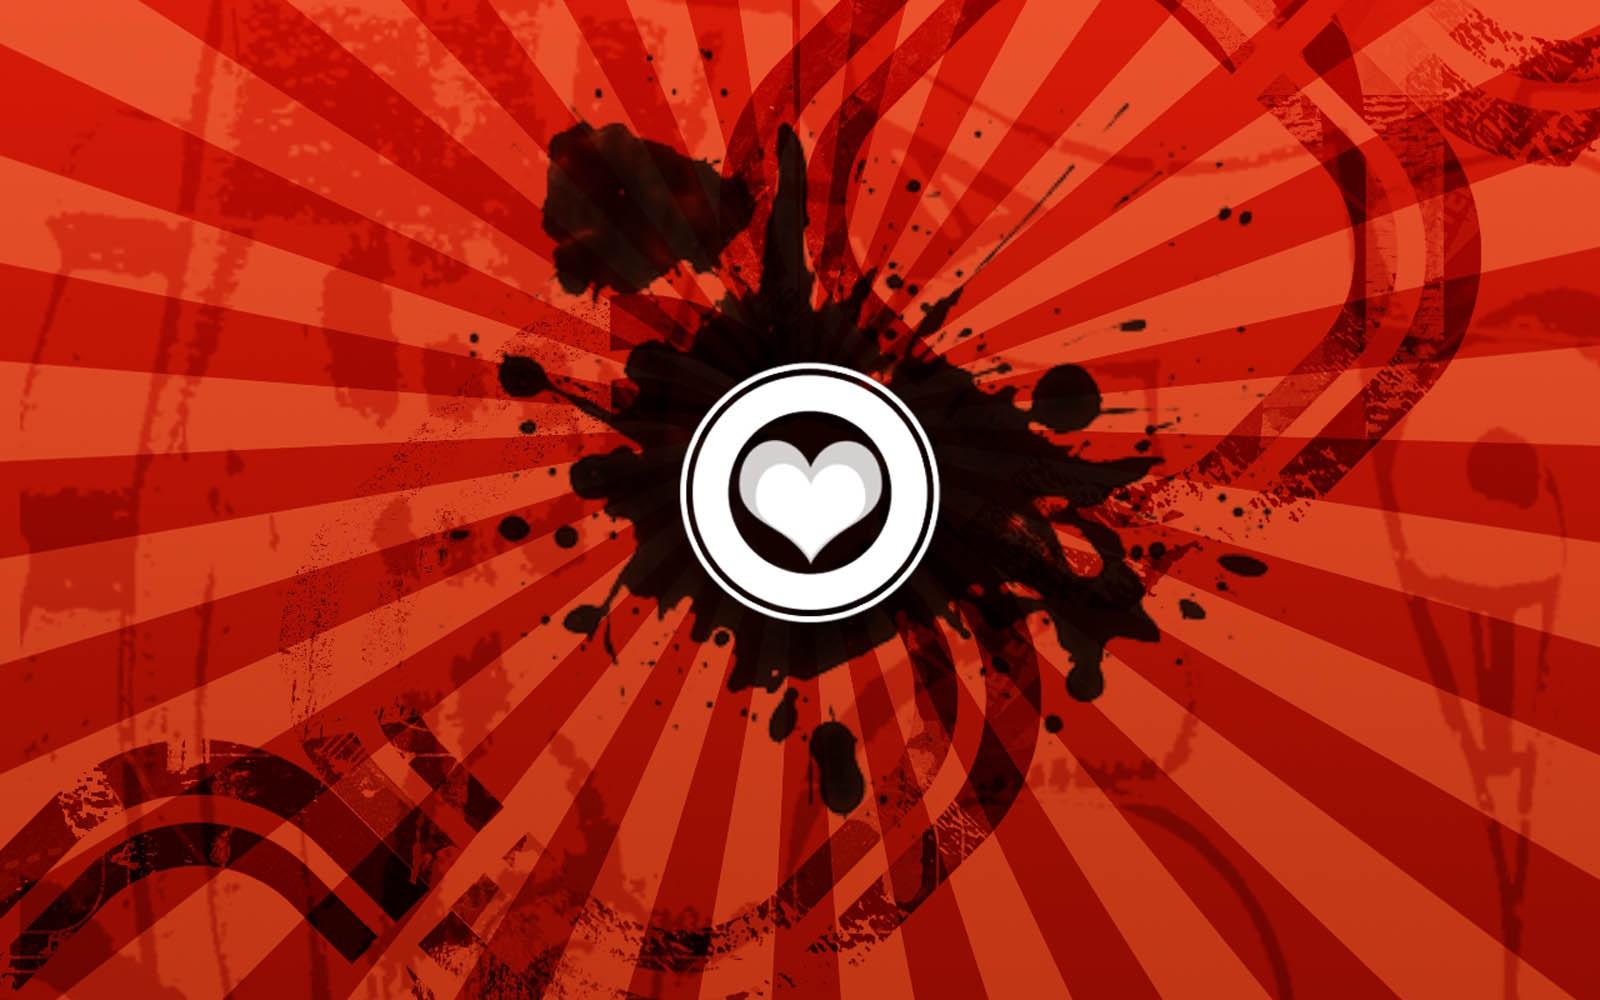 Love symbol best wallpaper love symbol buycottarizona Image collections